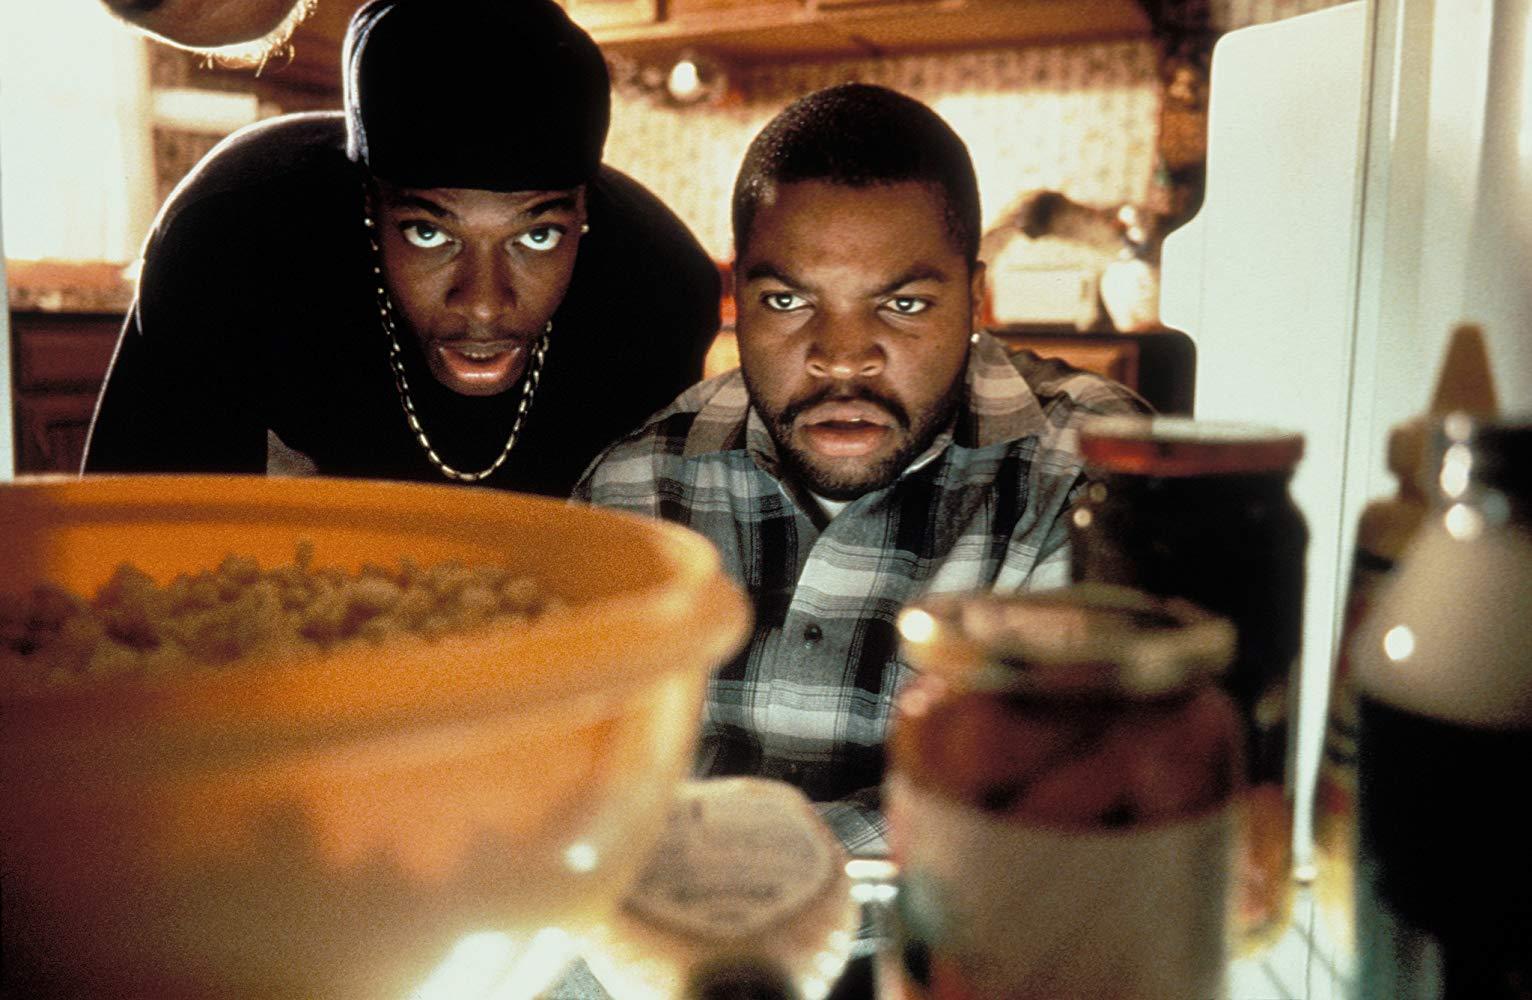 Chris Tucker and Ice Cube look into a fridge.